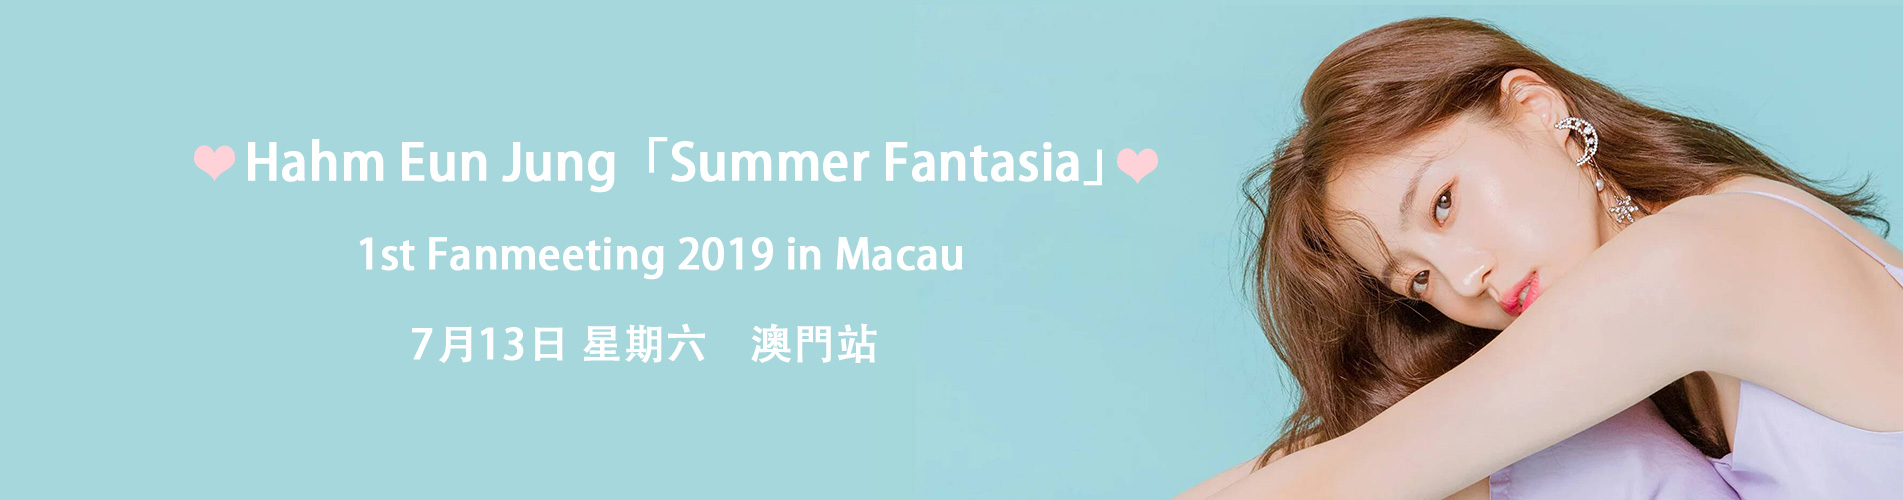 Hahm Eun Jung「Summer Fantasia」1st Fanmeeting in Macau